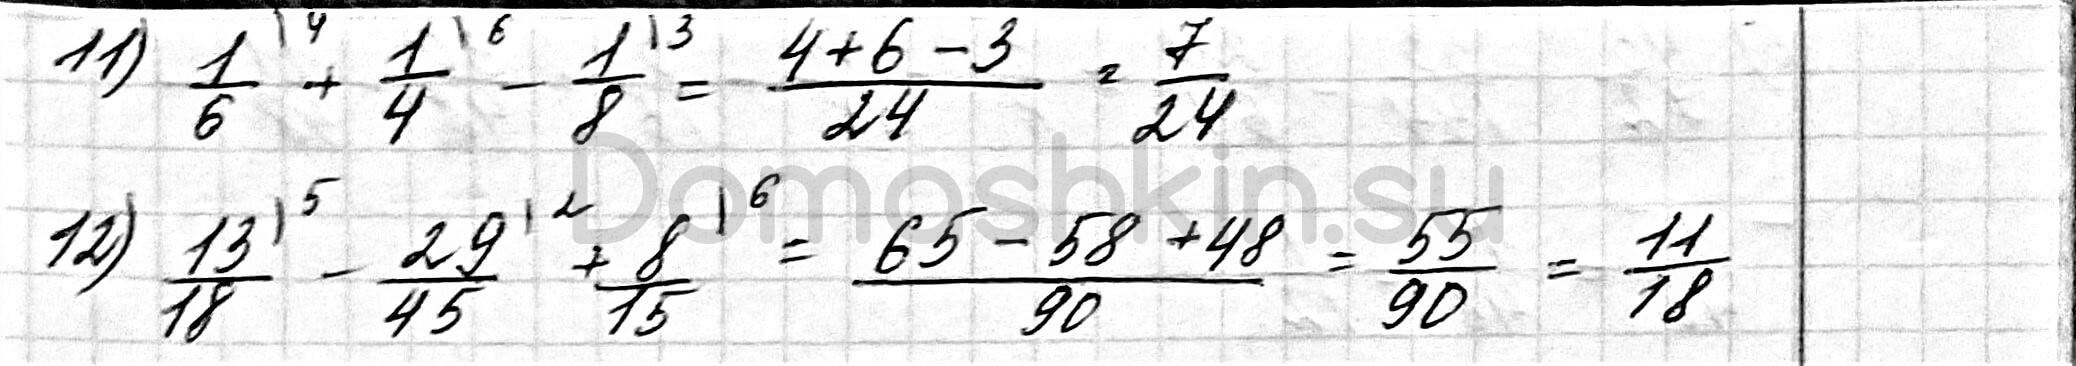 Математика 6 класс учебник Мерзляк номер 268 решение